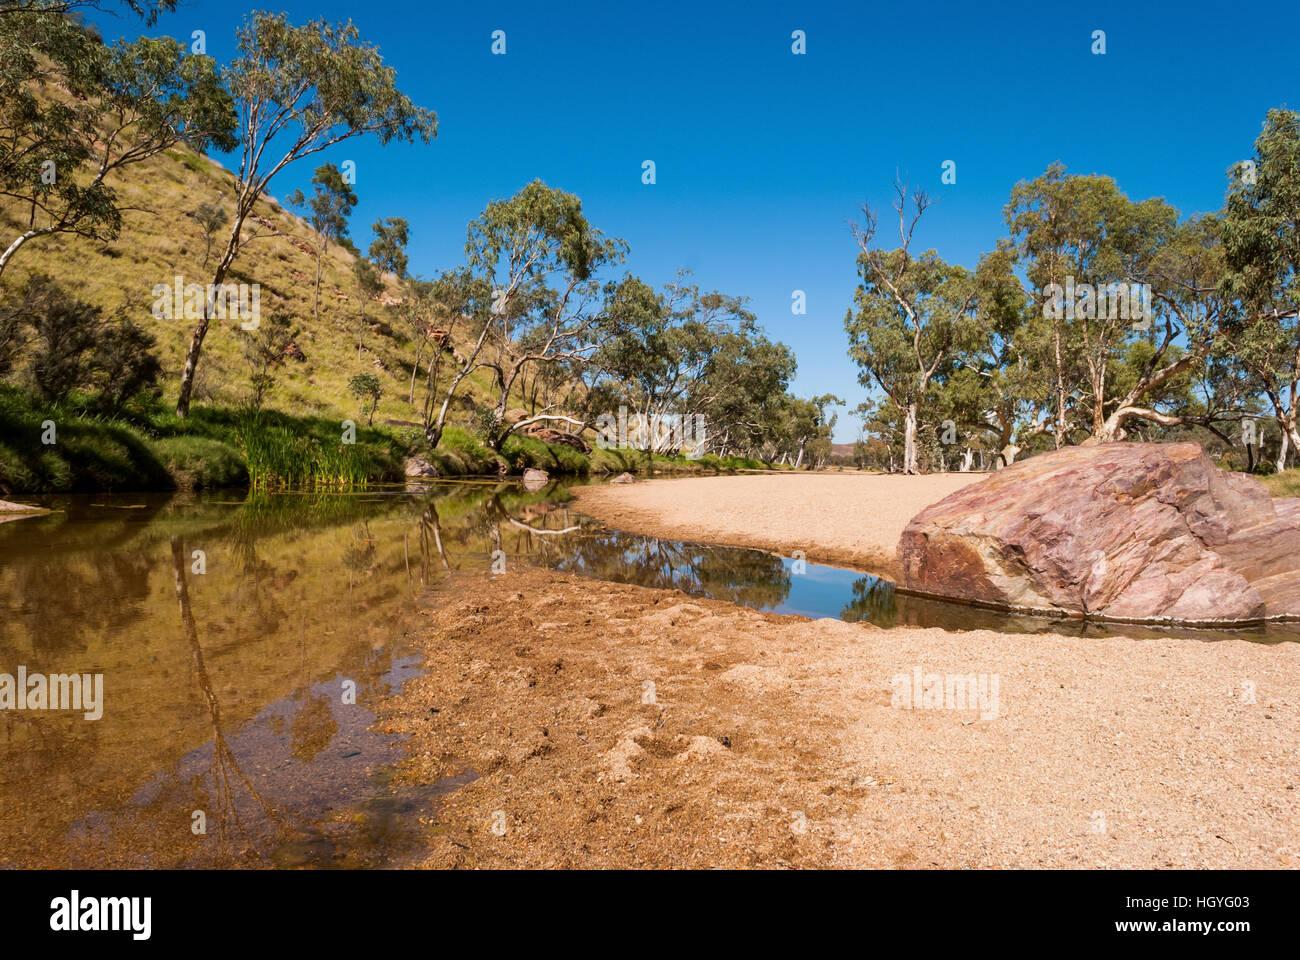 Simpsons Gap, MacDonnell Ranges, Australia Stock Photo